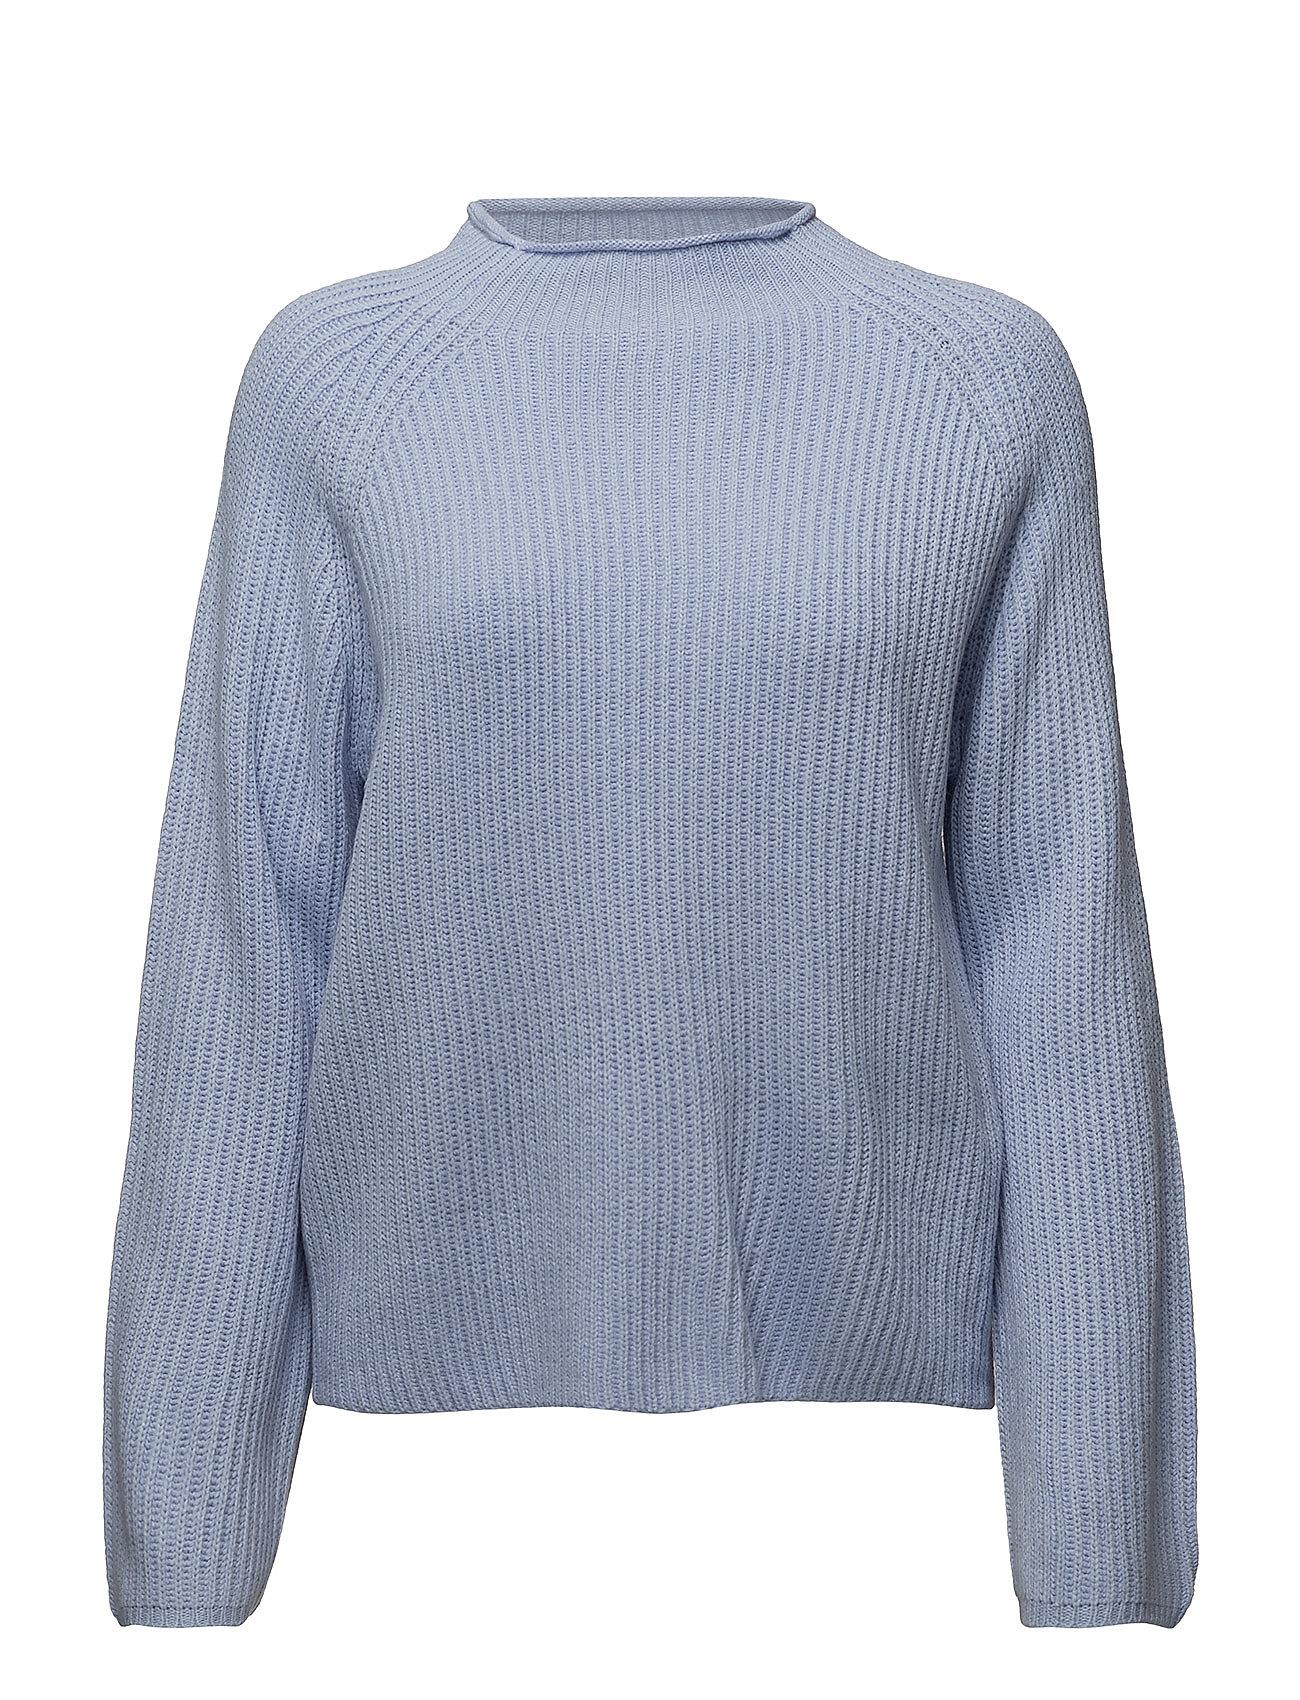 Mango Neck detail sweater